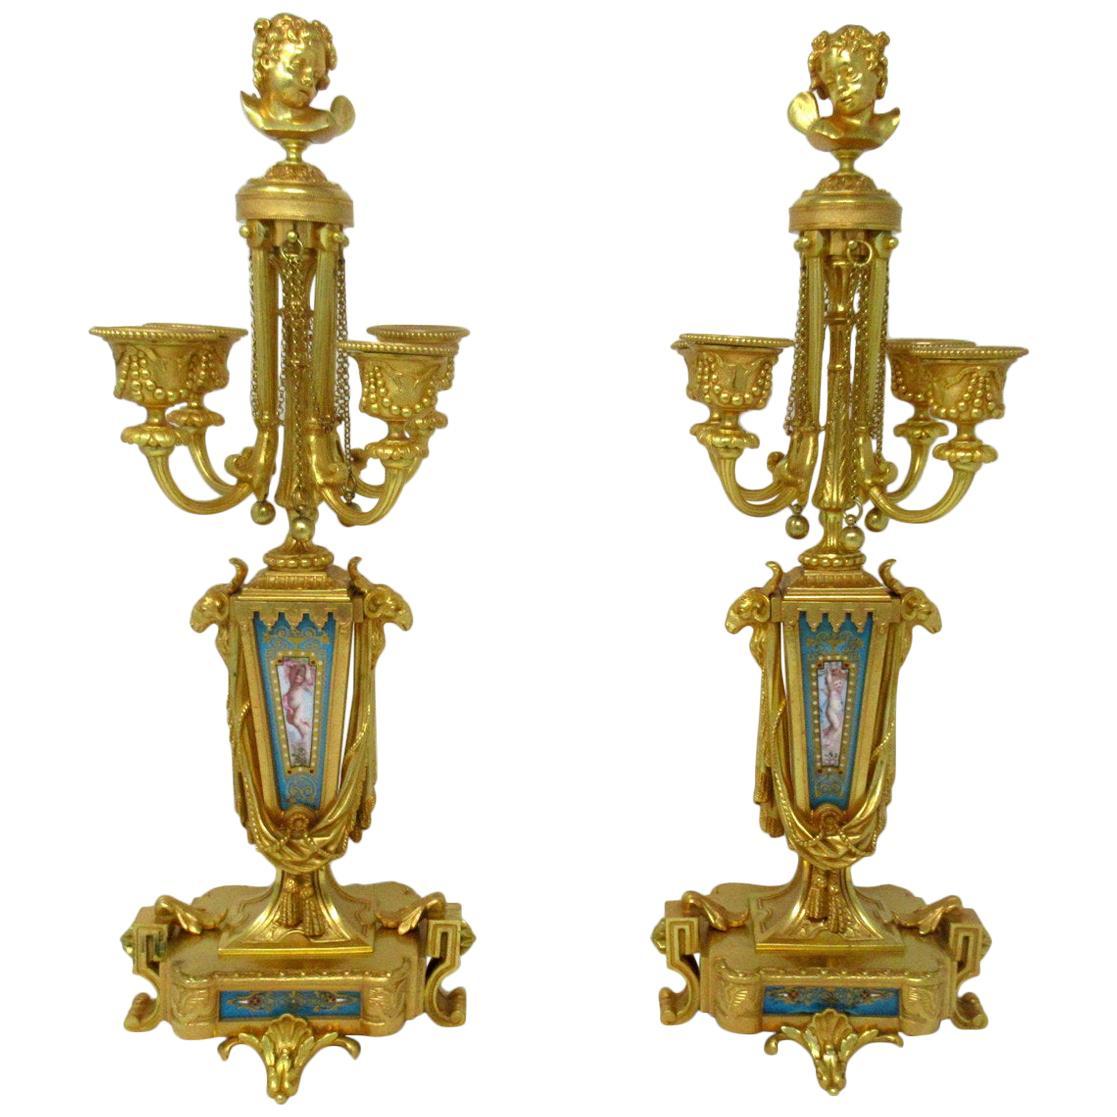 Antique French Sèvres Porcelain Ormolu Gilt Bronze Candelabra Barbedienne, Pair